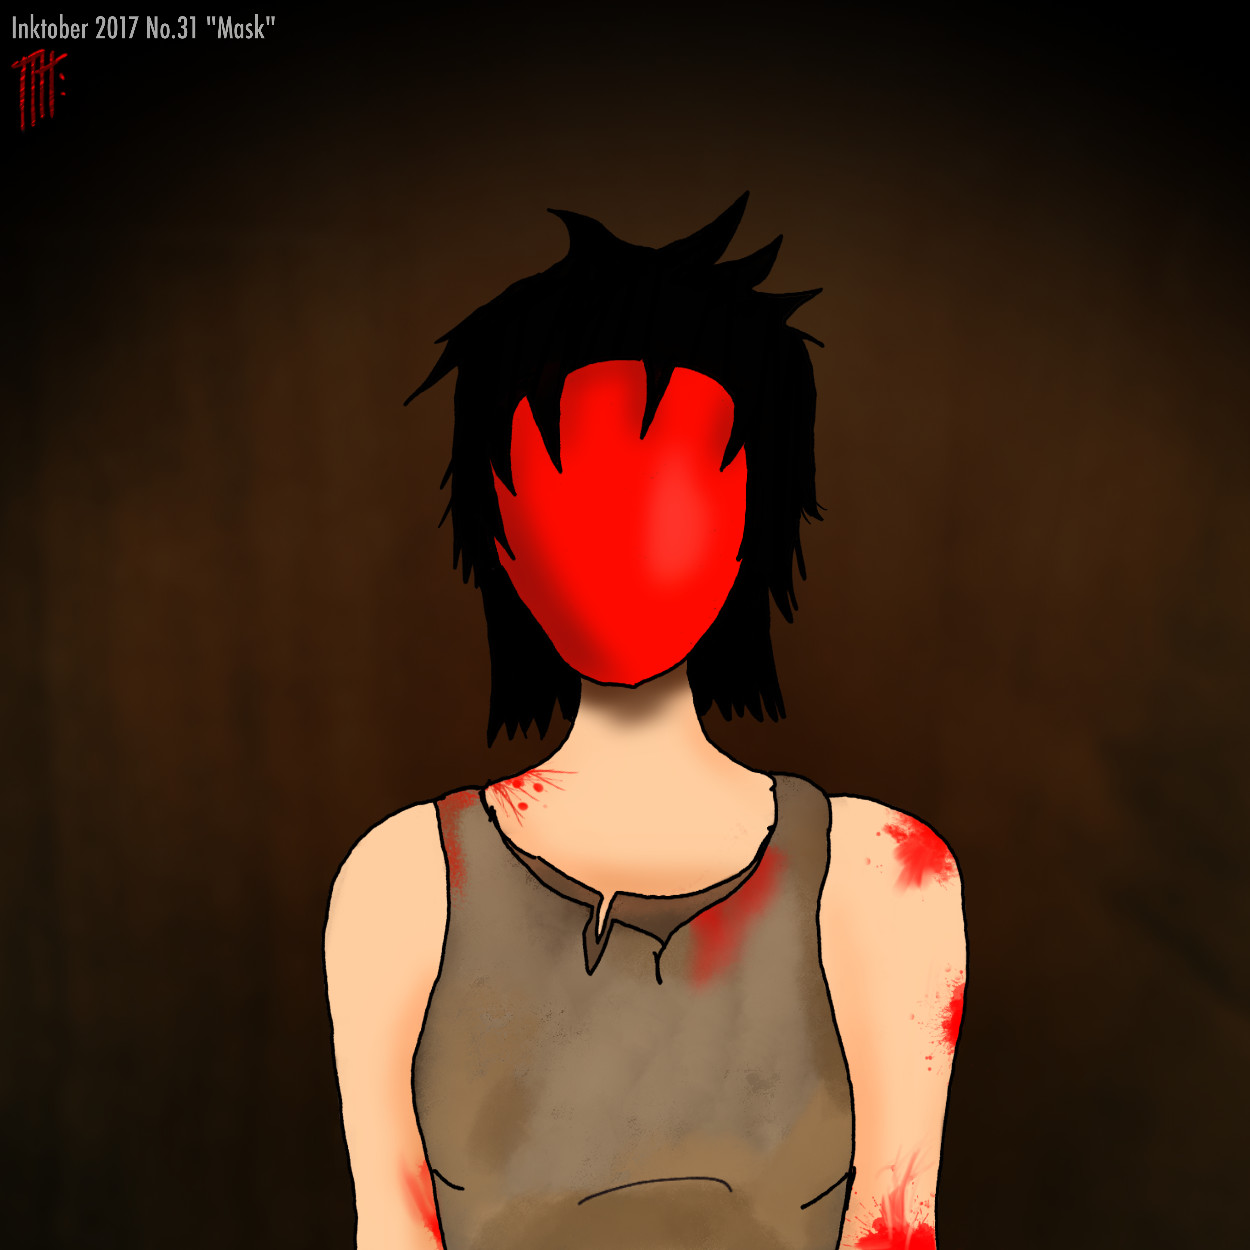 31 Mask